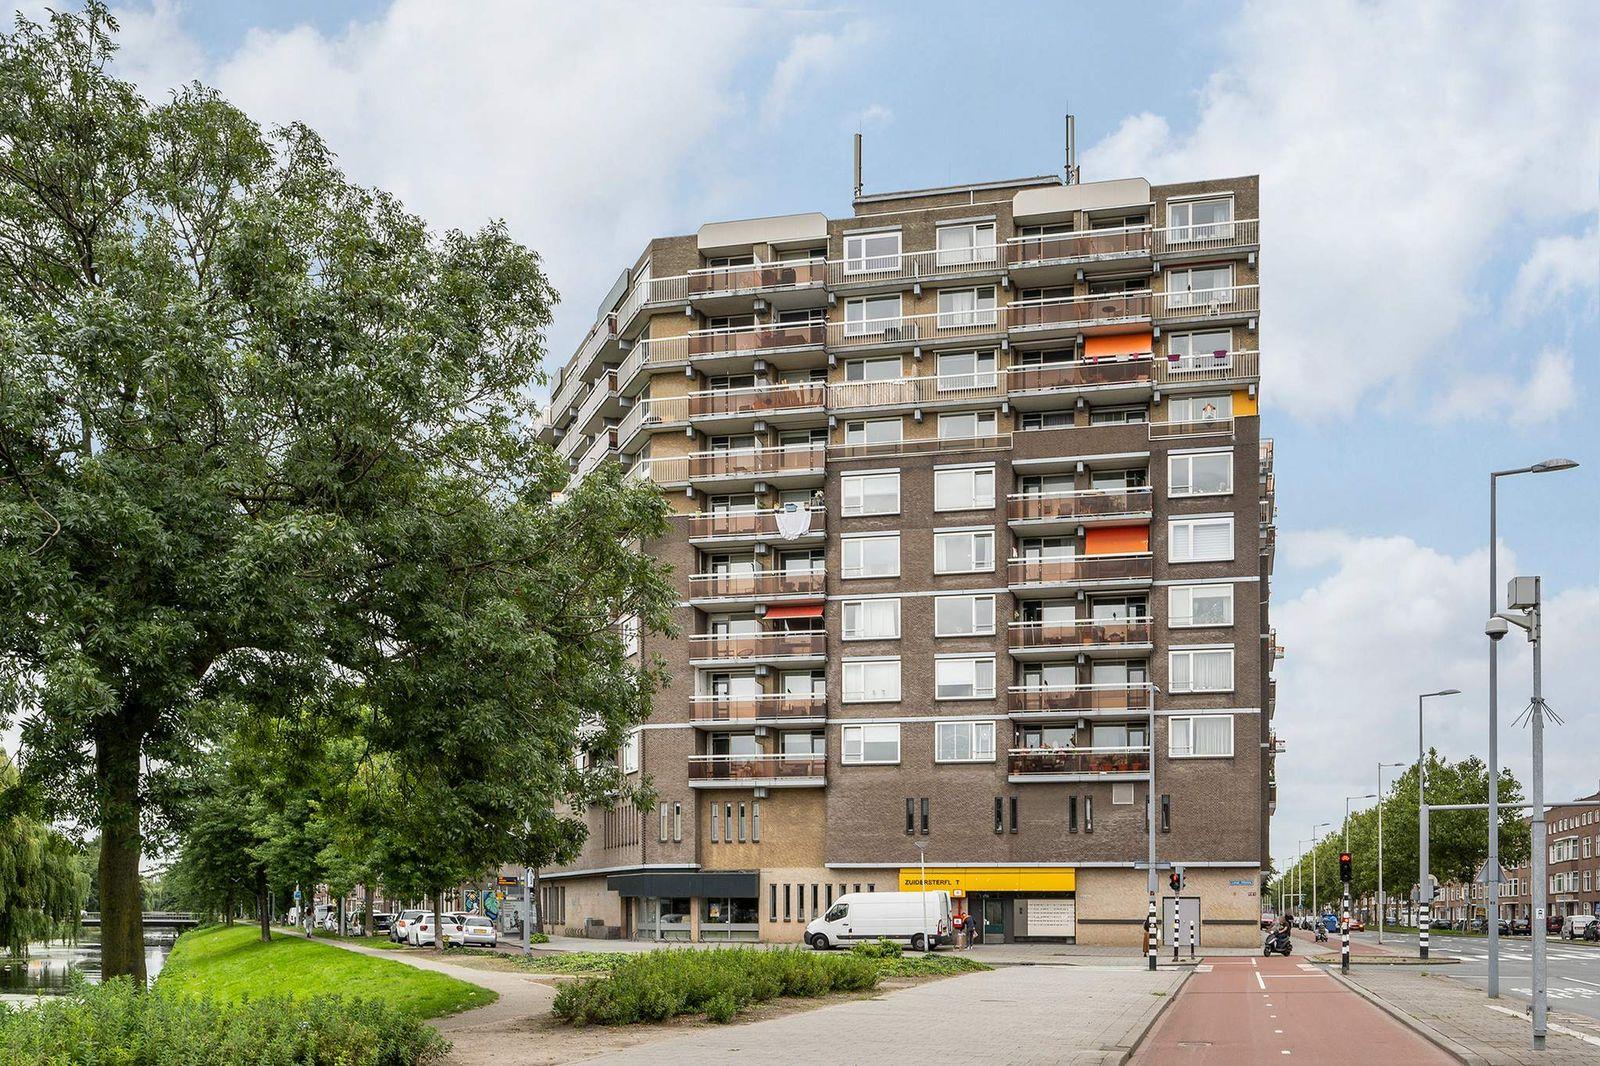 Strevelsweg 261, Rotterdam